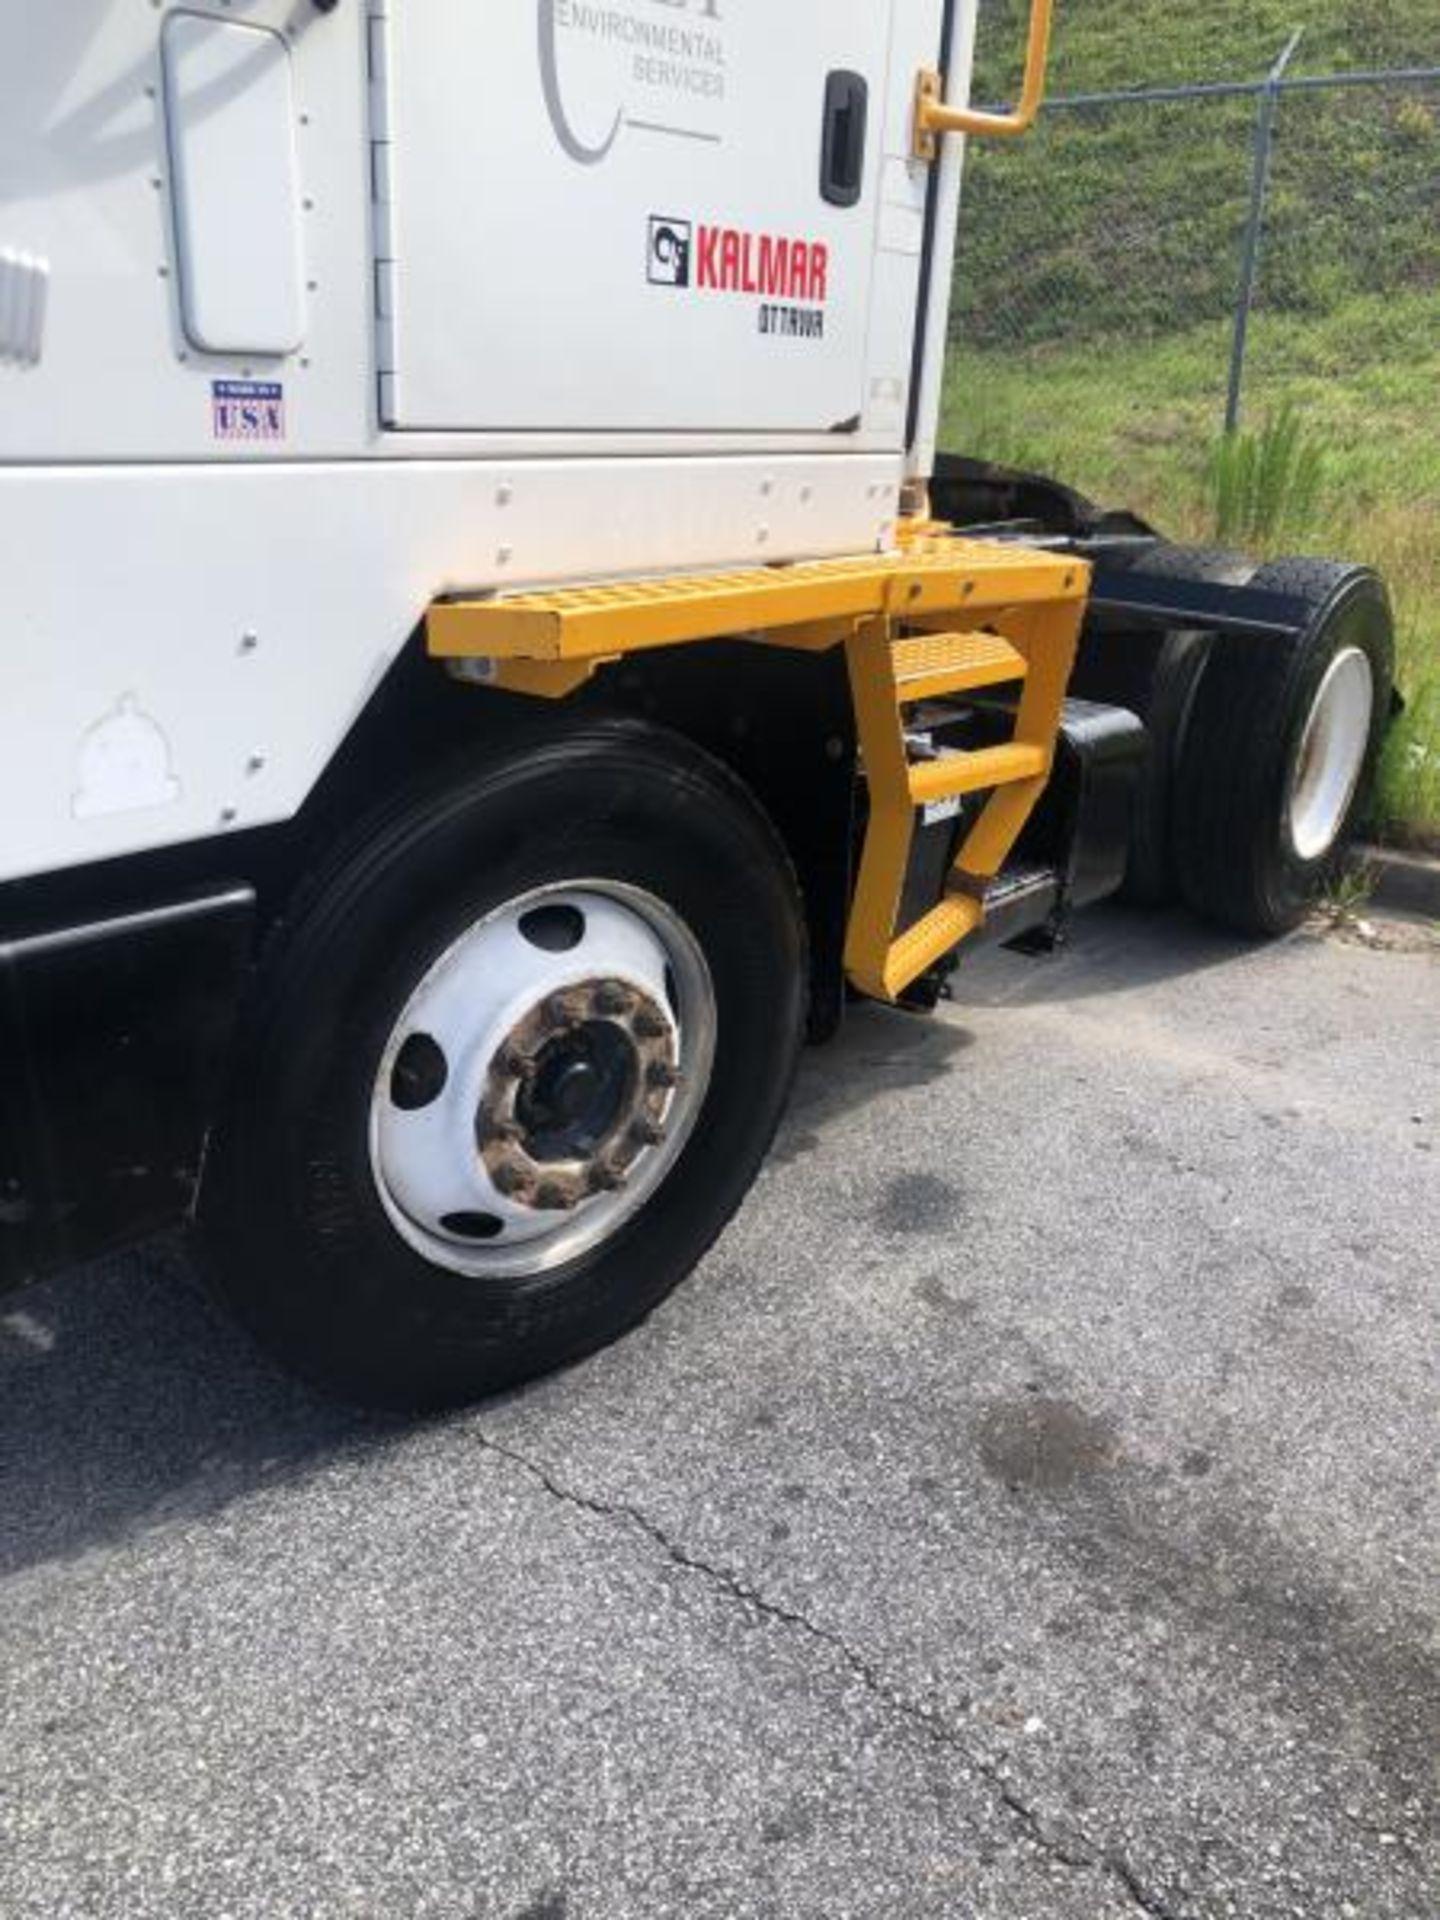 2015 Kalmar Ottawa 4x2 Yard Truck , SN: 338837 3,239.3 Hours, 3,125 Miles - Image 6 of 32